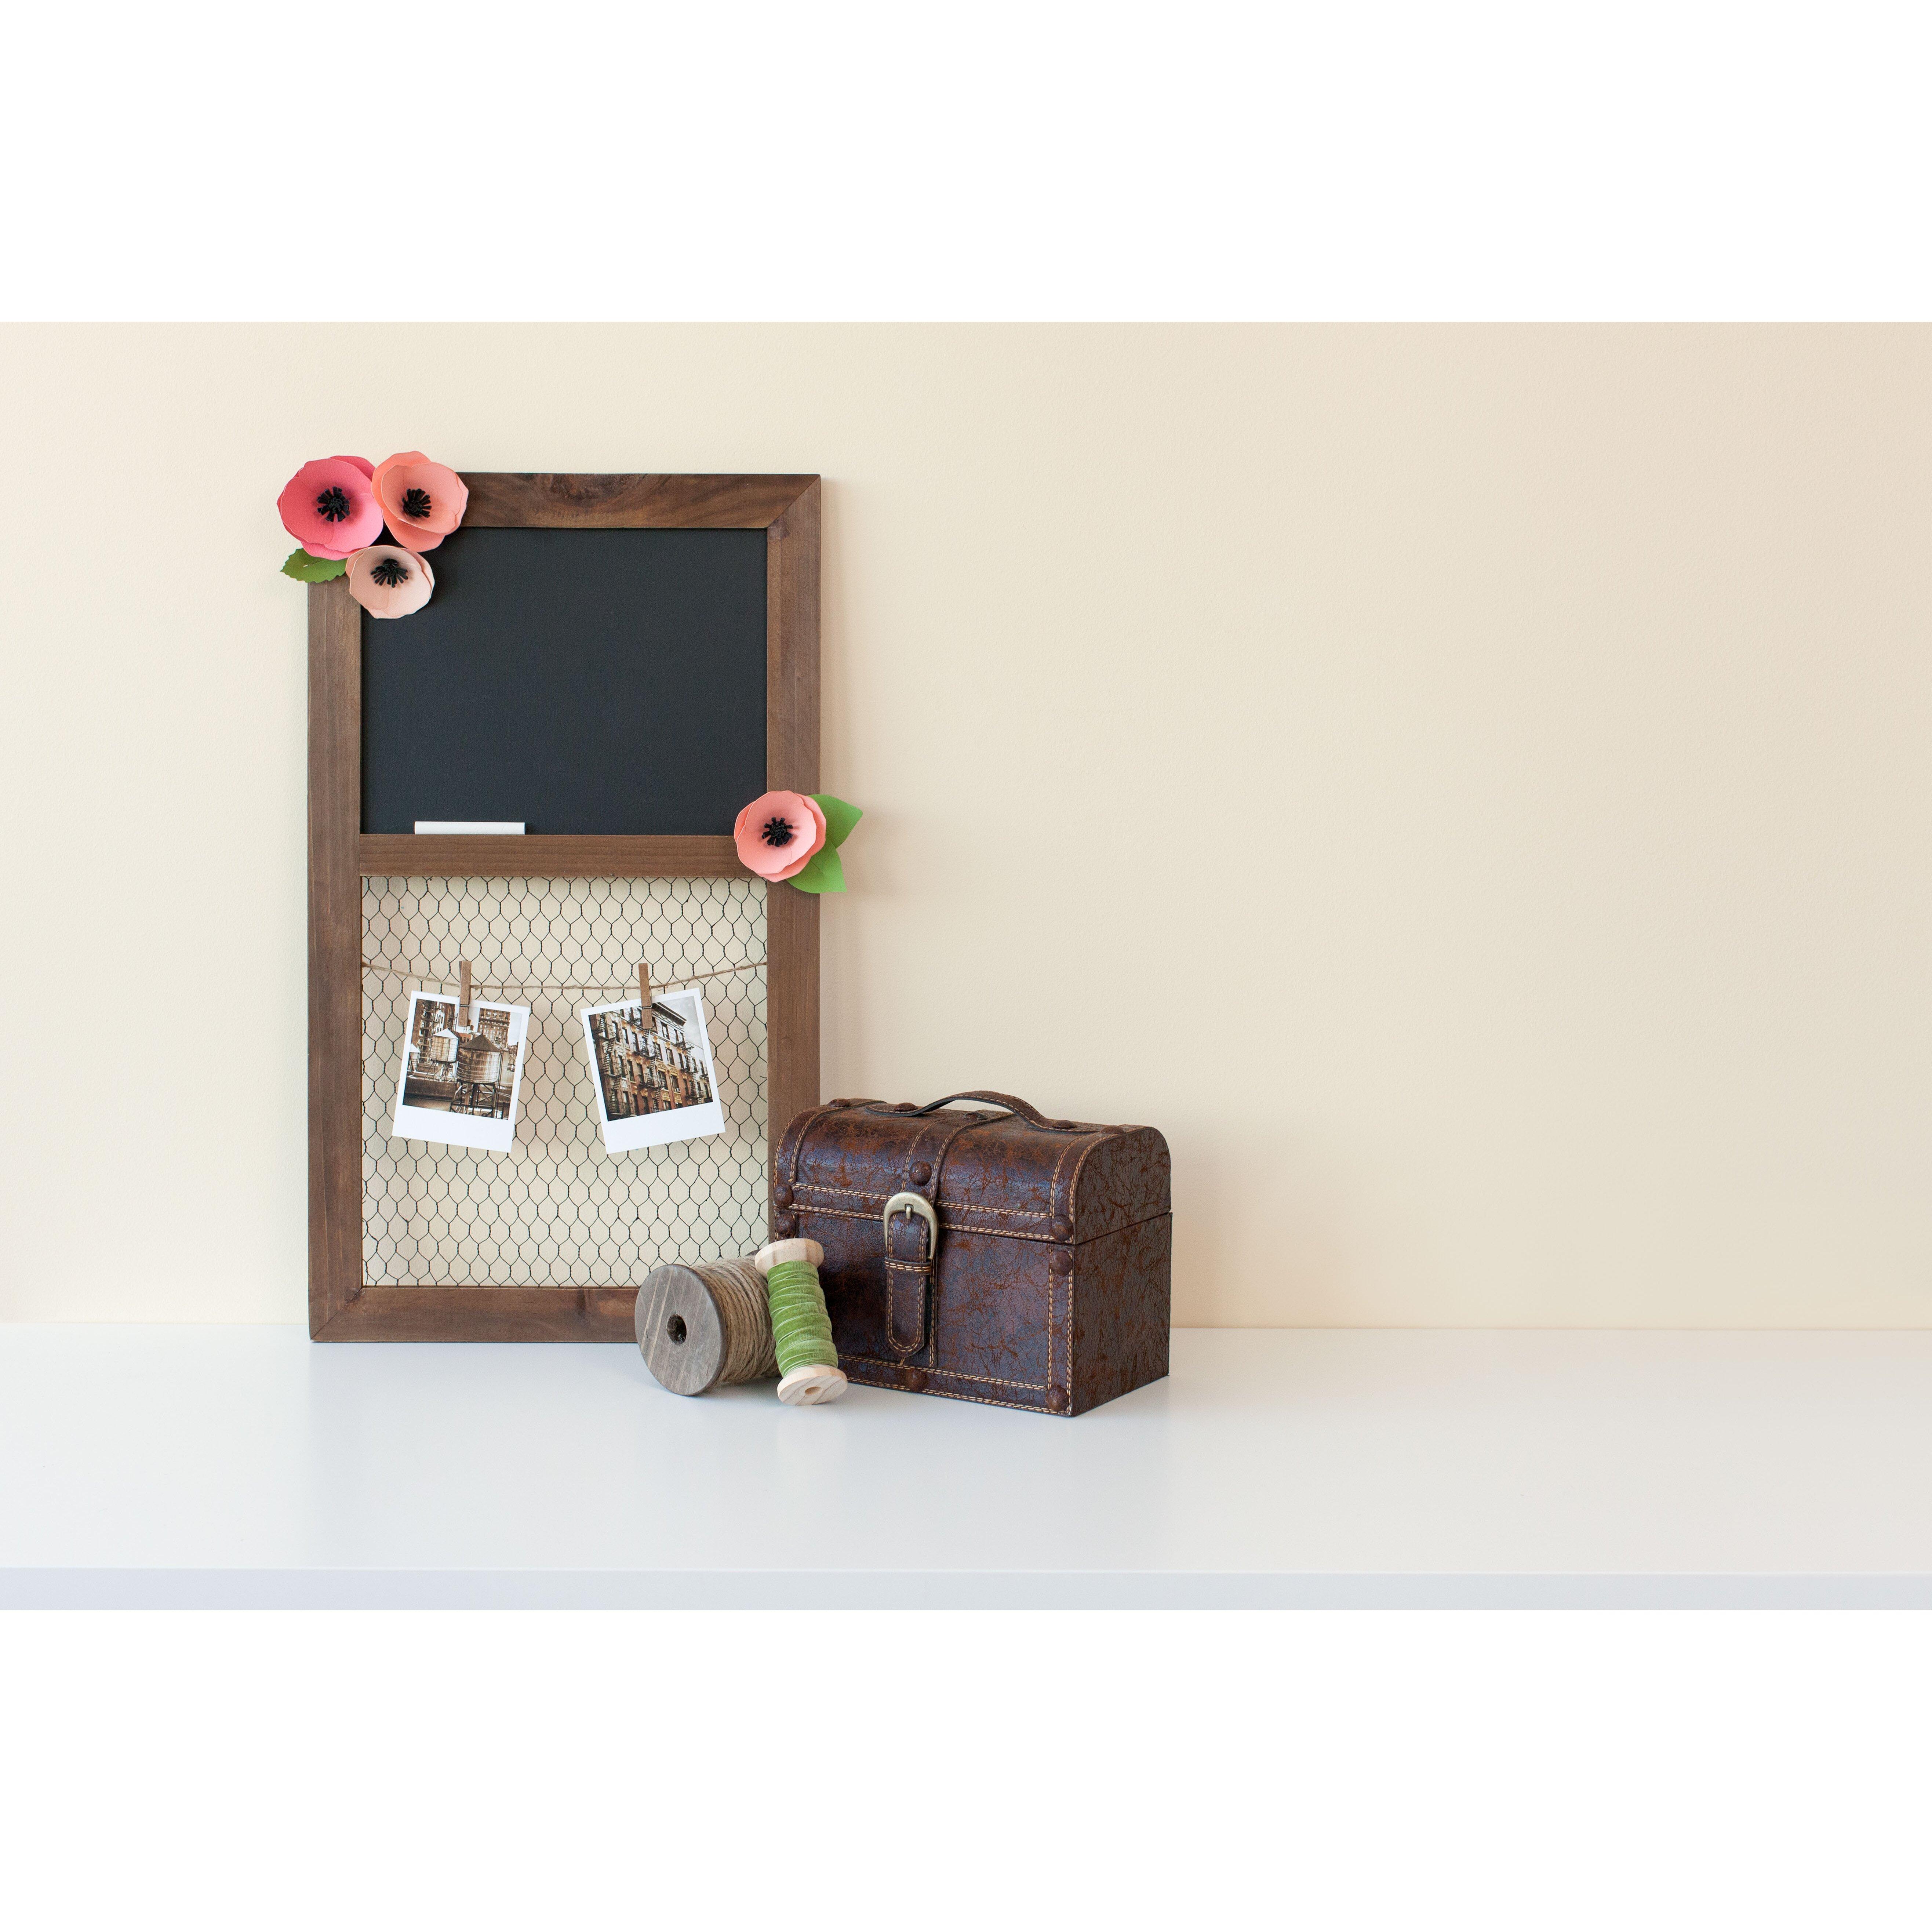 Cricut Cartridge Home Decor: Cricut 3D Floral Home Decor Cartridge